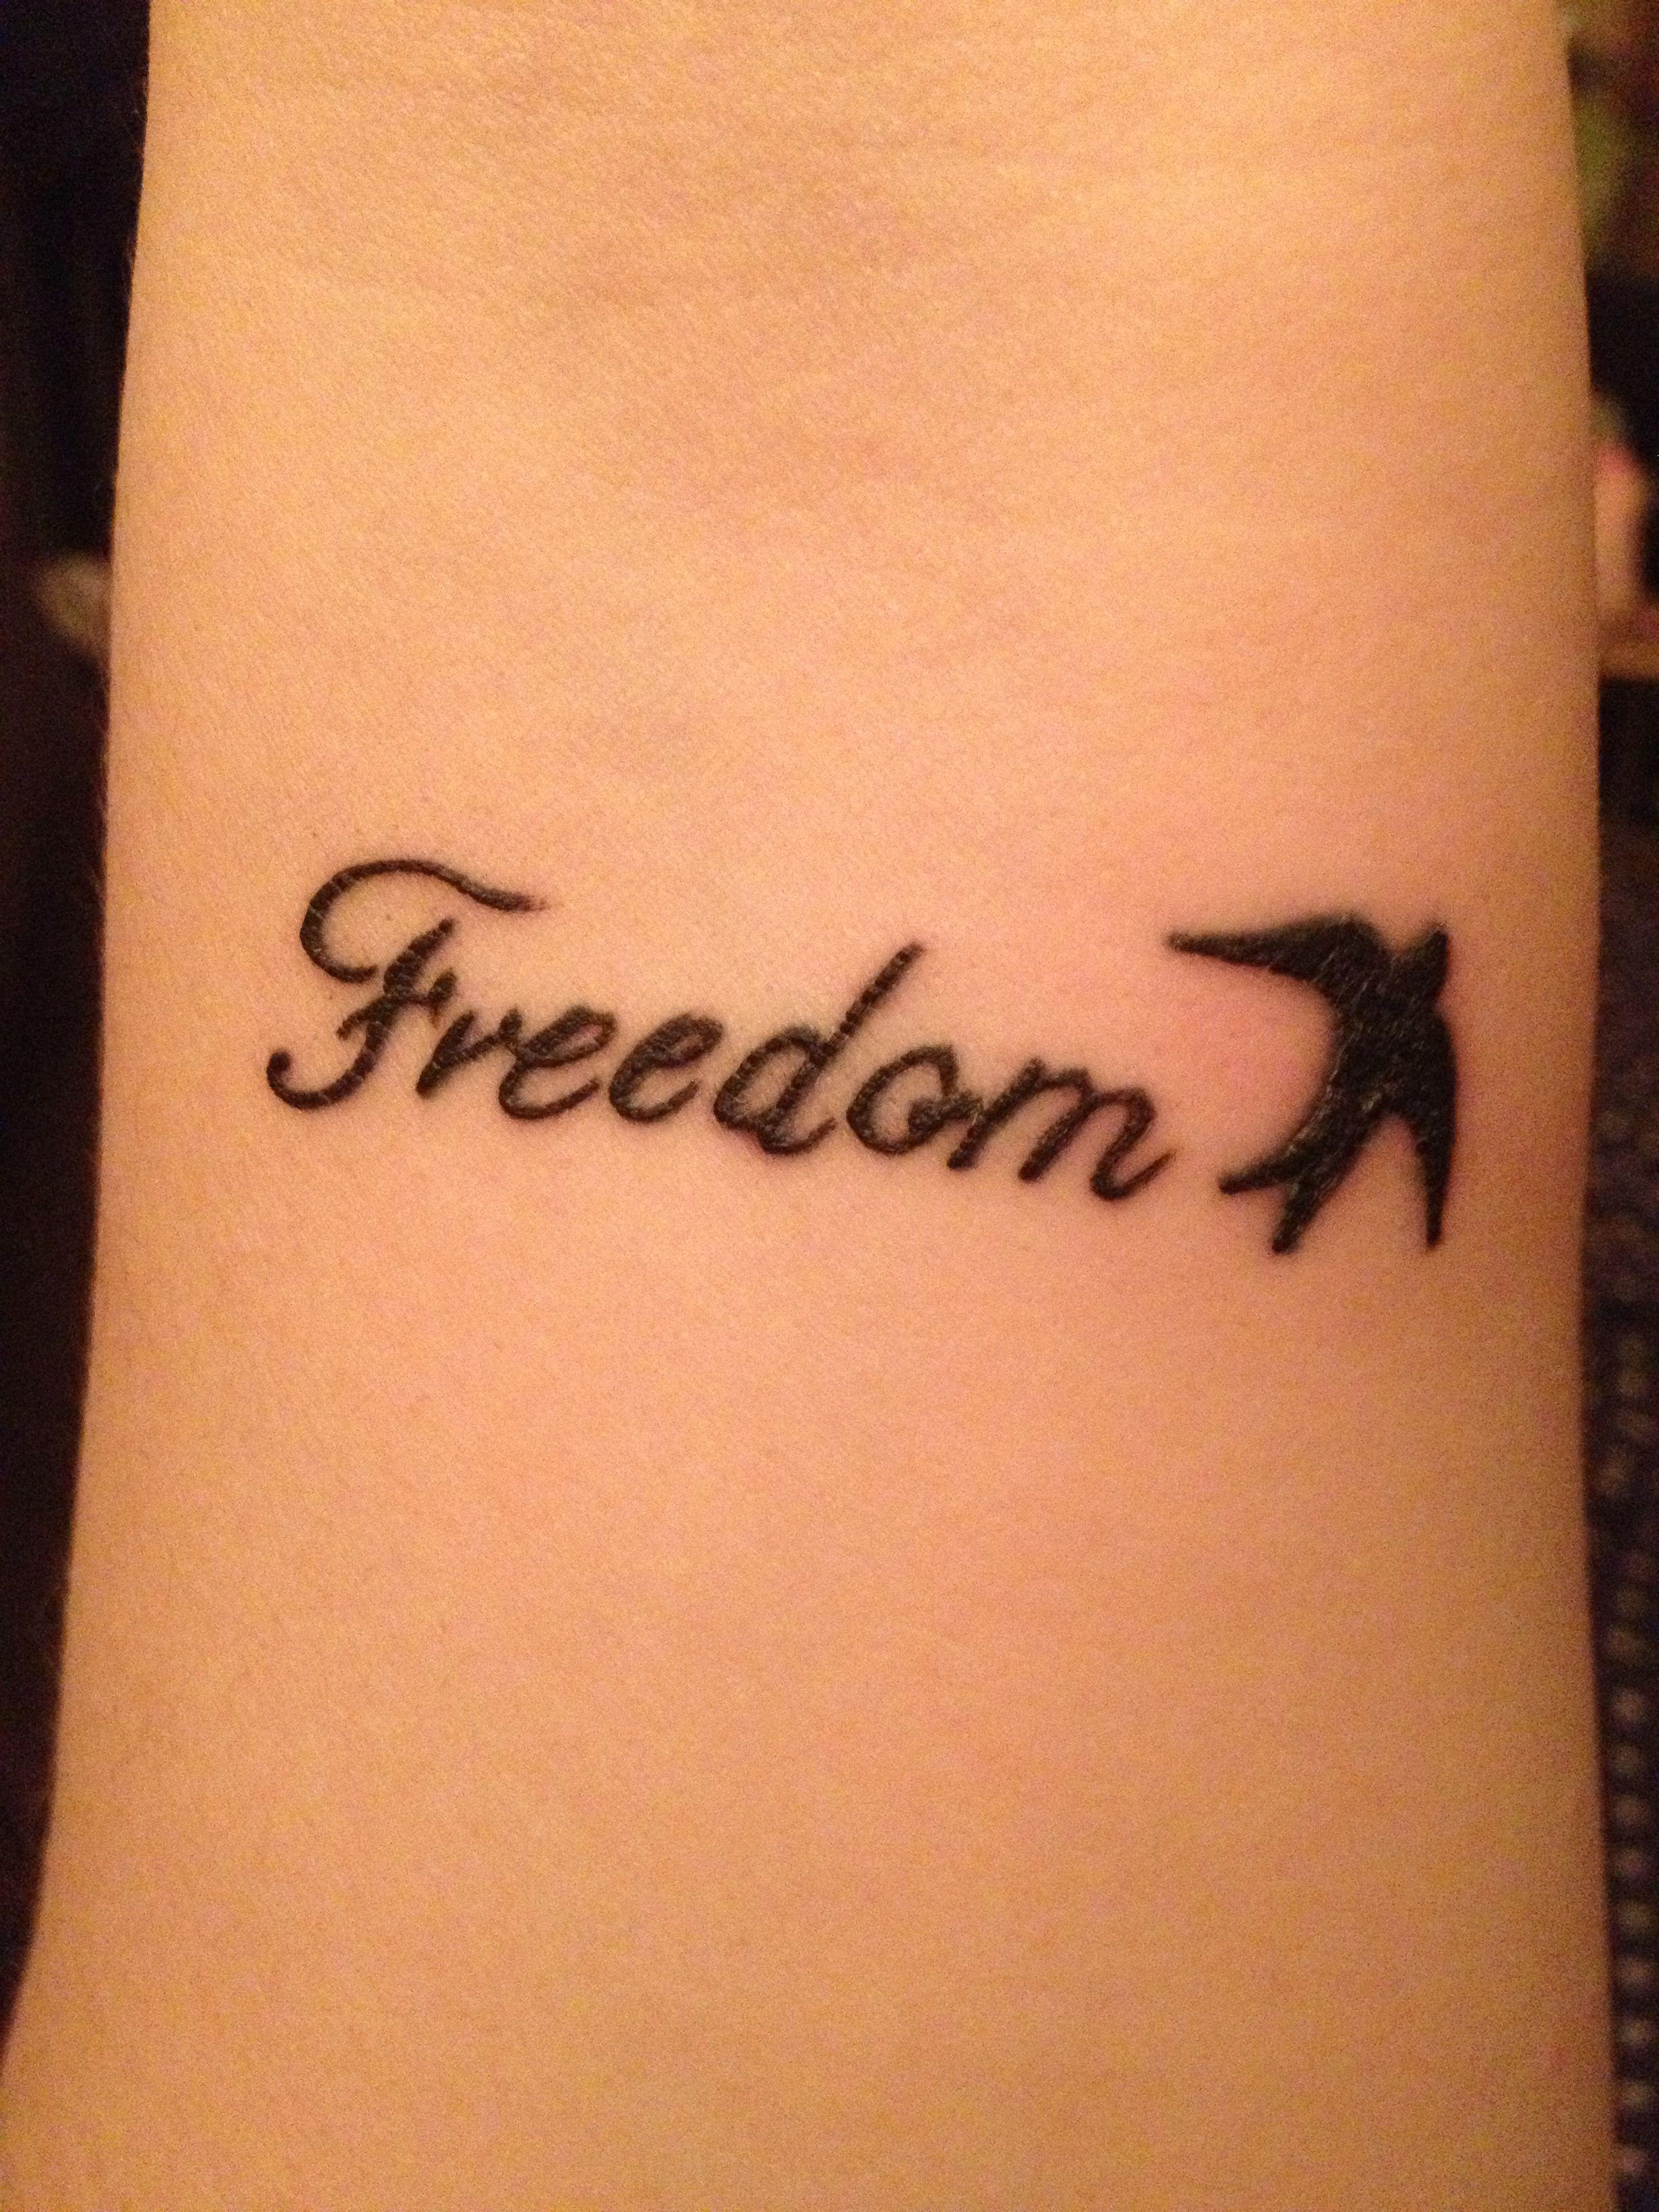 freedom tattoo design images for tatouage. Black Bedroom Furniture Sets. Home Design Ideas